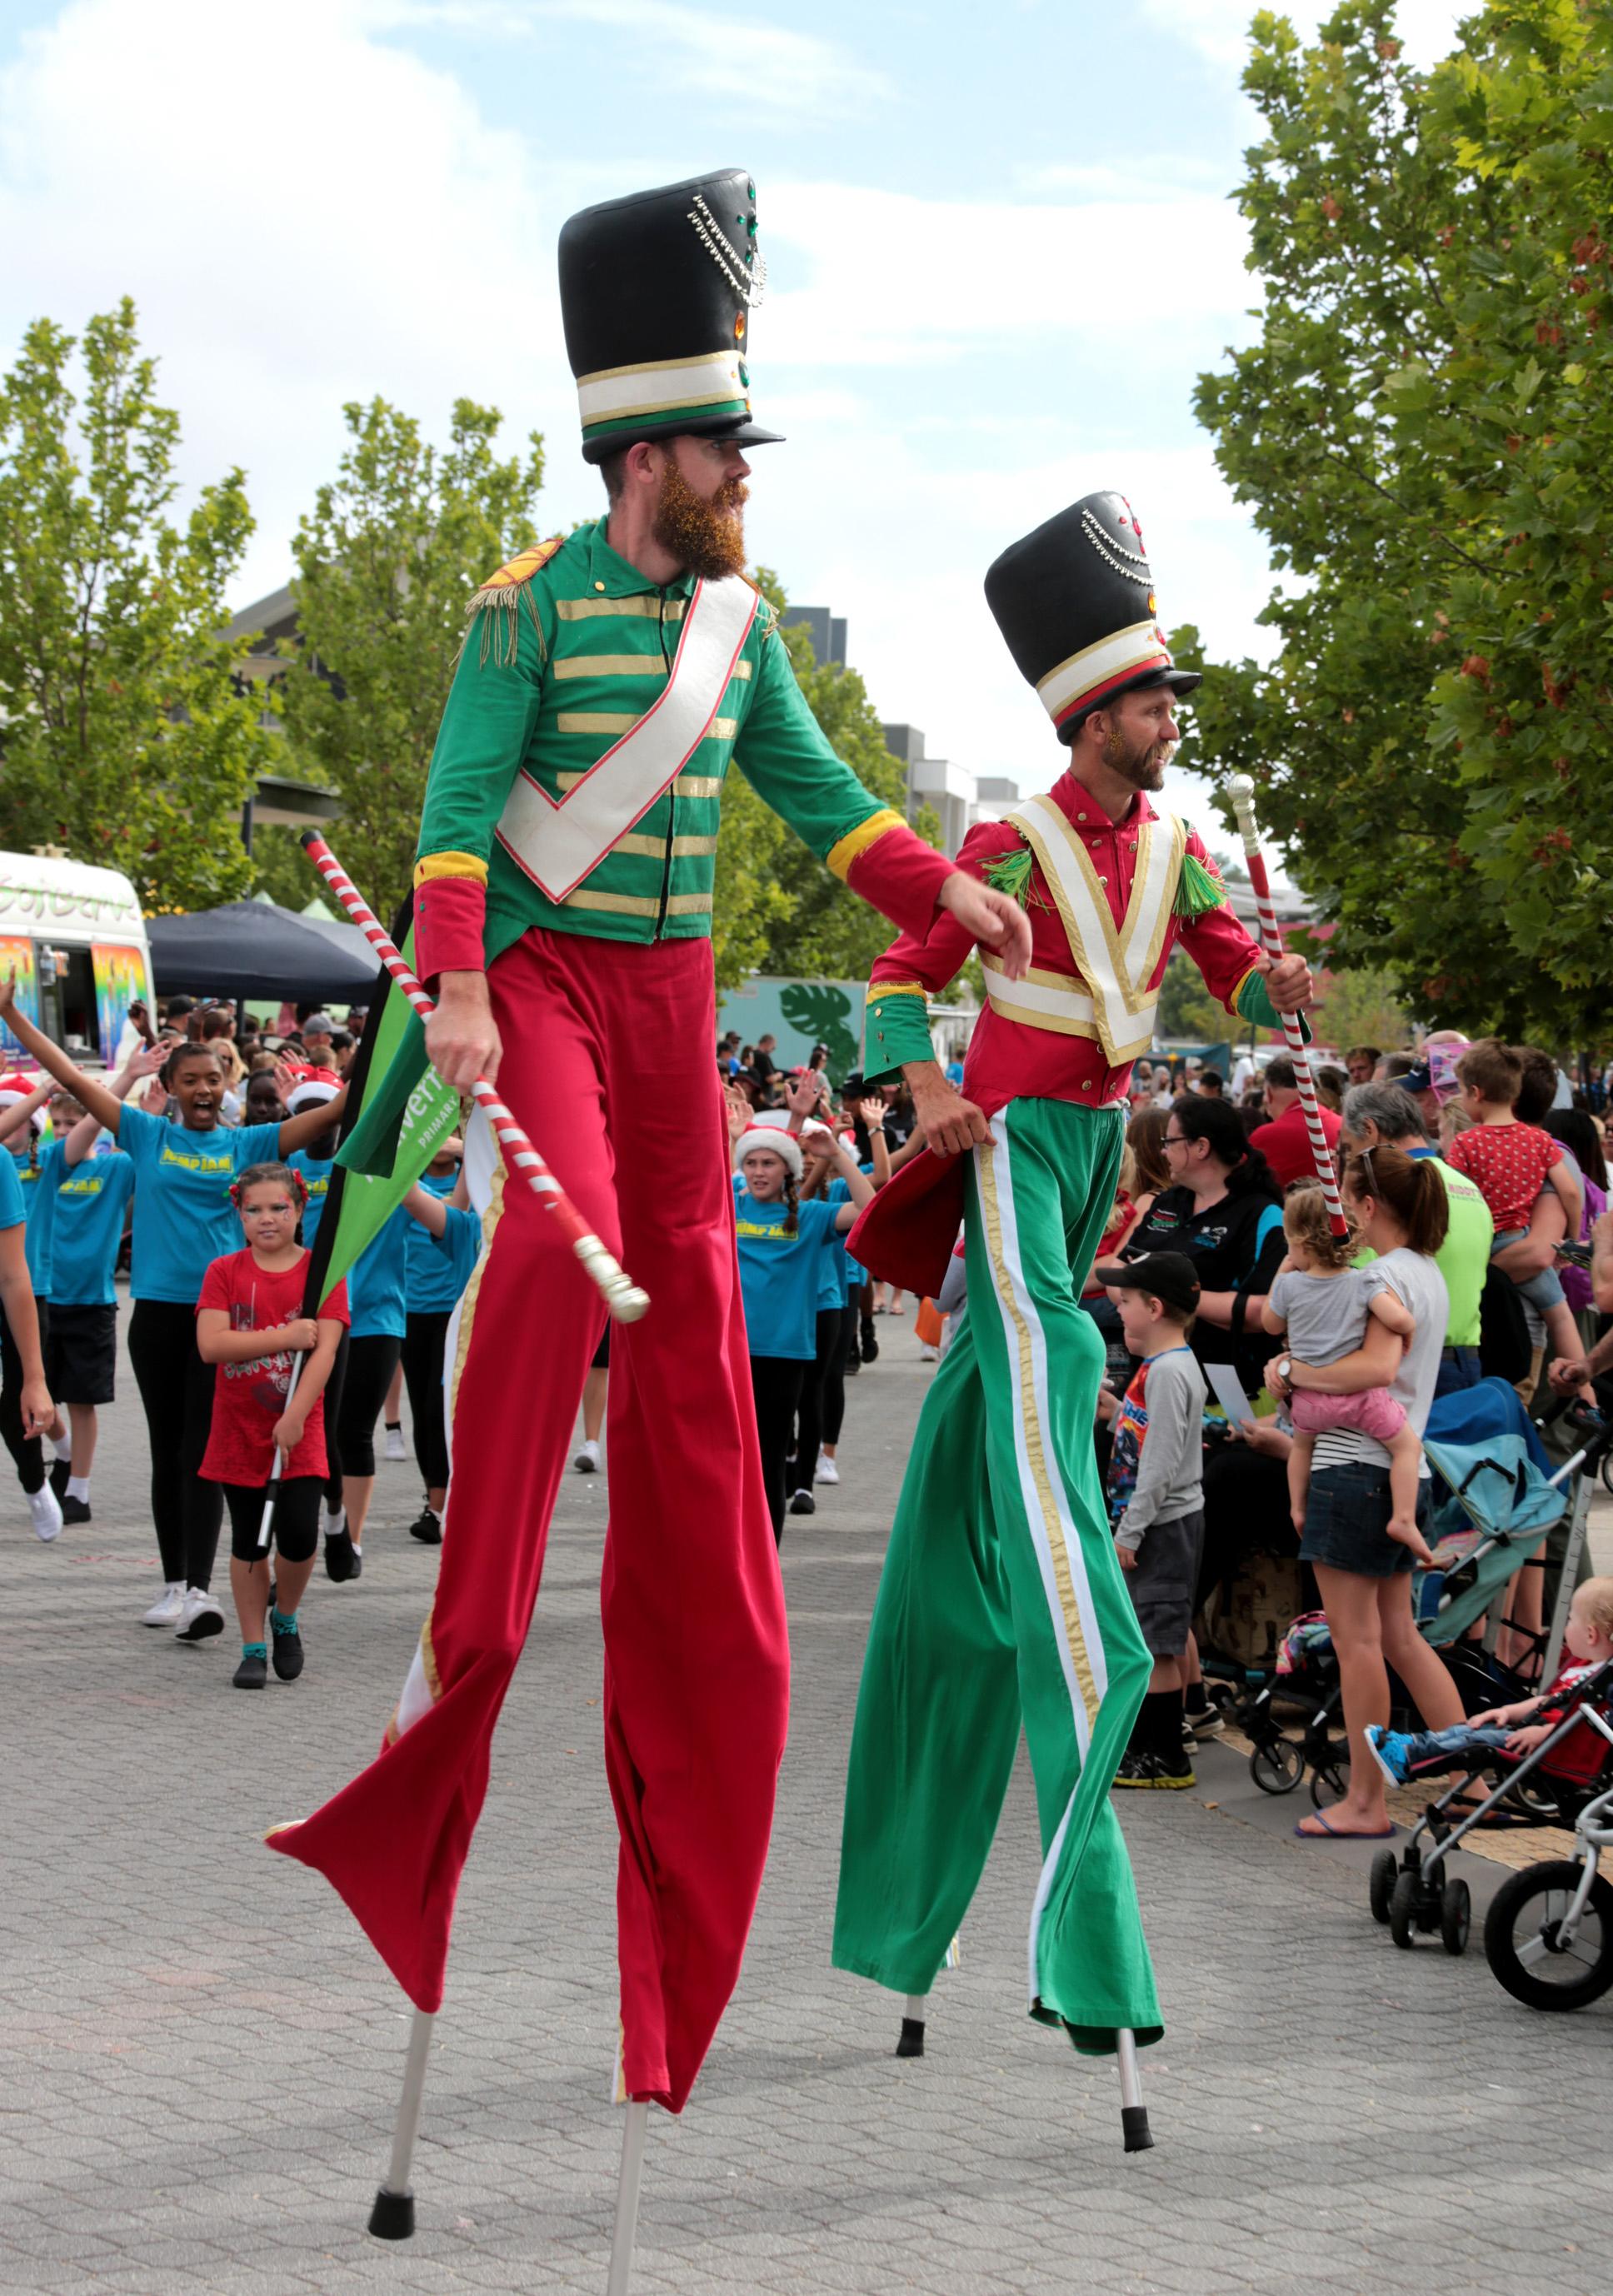 On stilts at the Elfenbrook Christmas Parade in Ellenbrook. Picture: David Baylis d463035